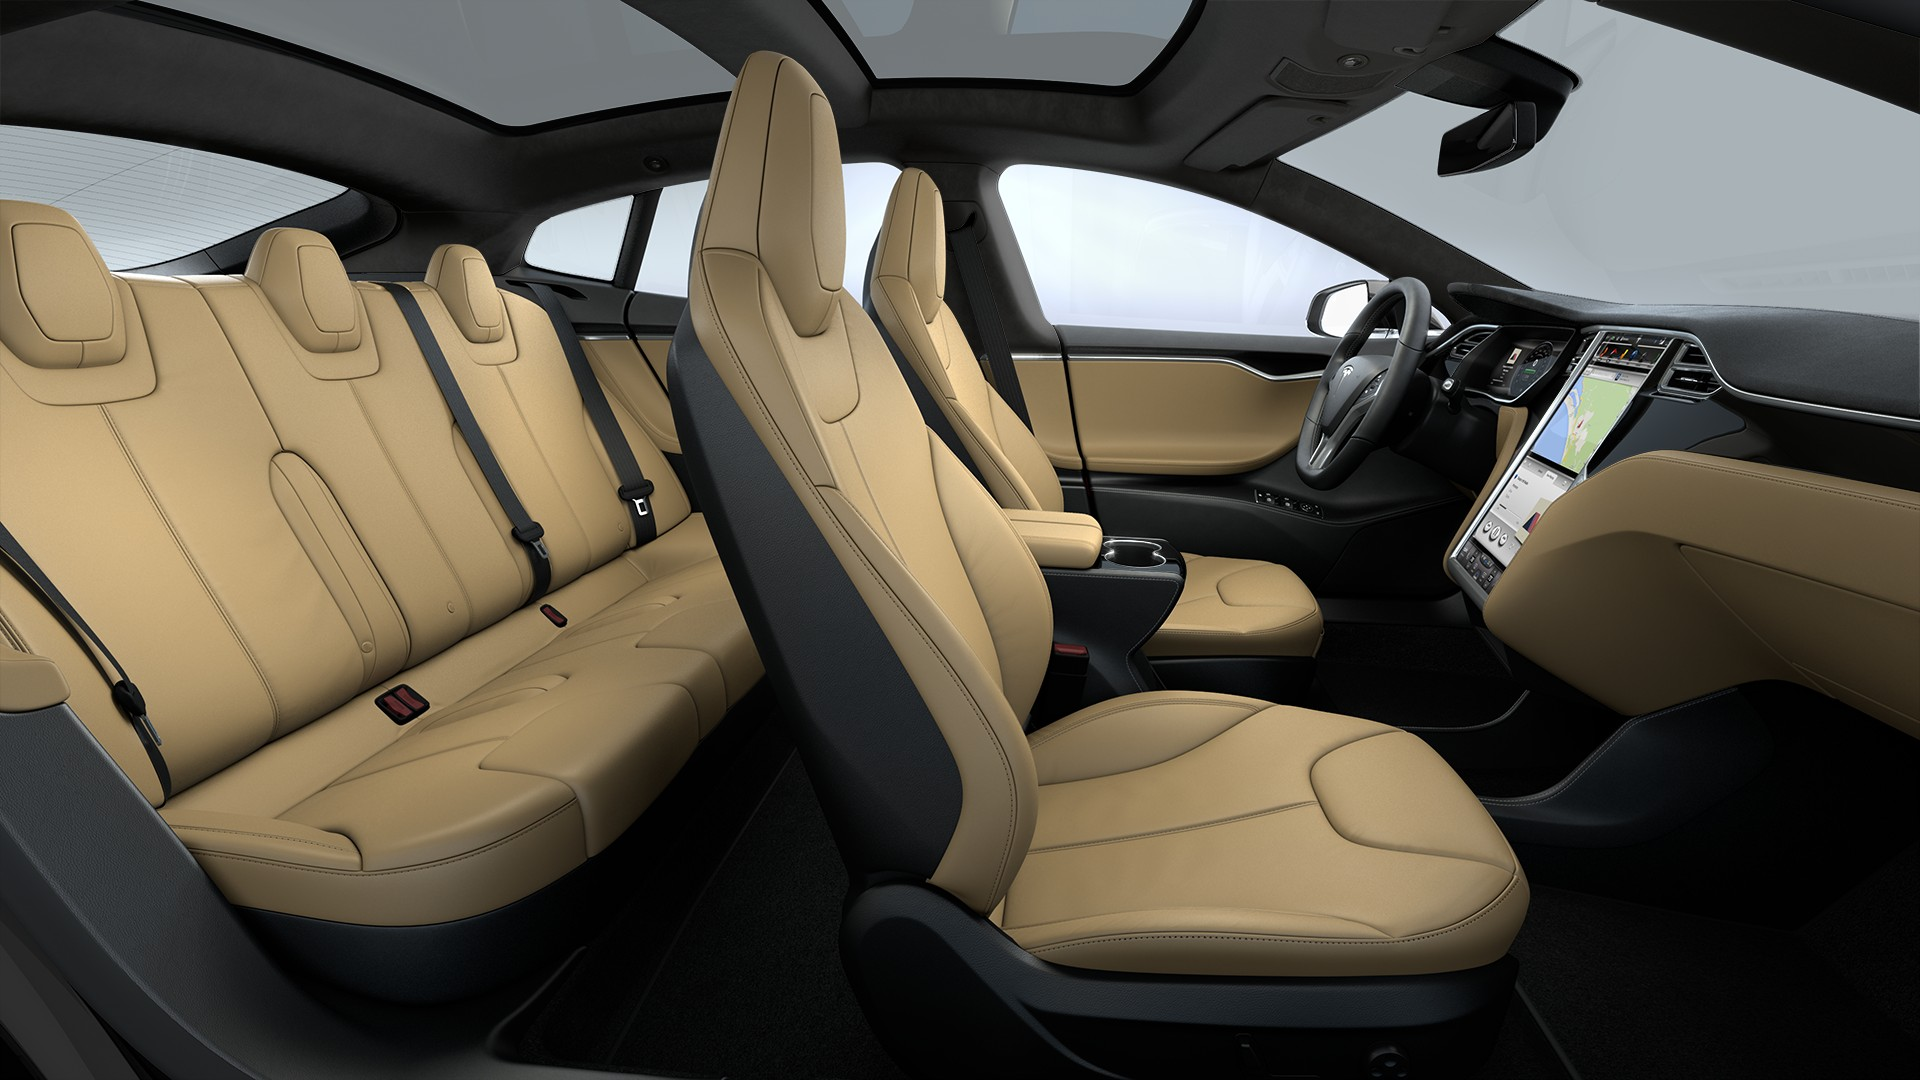 Interieur Tan Leather Seats Piano Black Decor Black Alcantara Headliner Alcantara Dashboard Accents